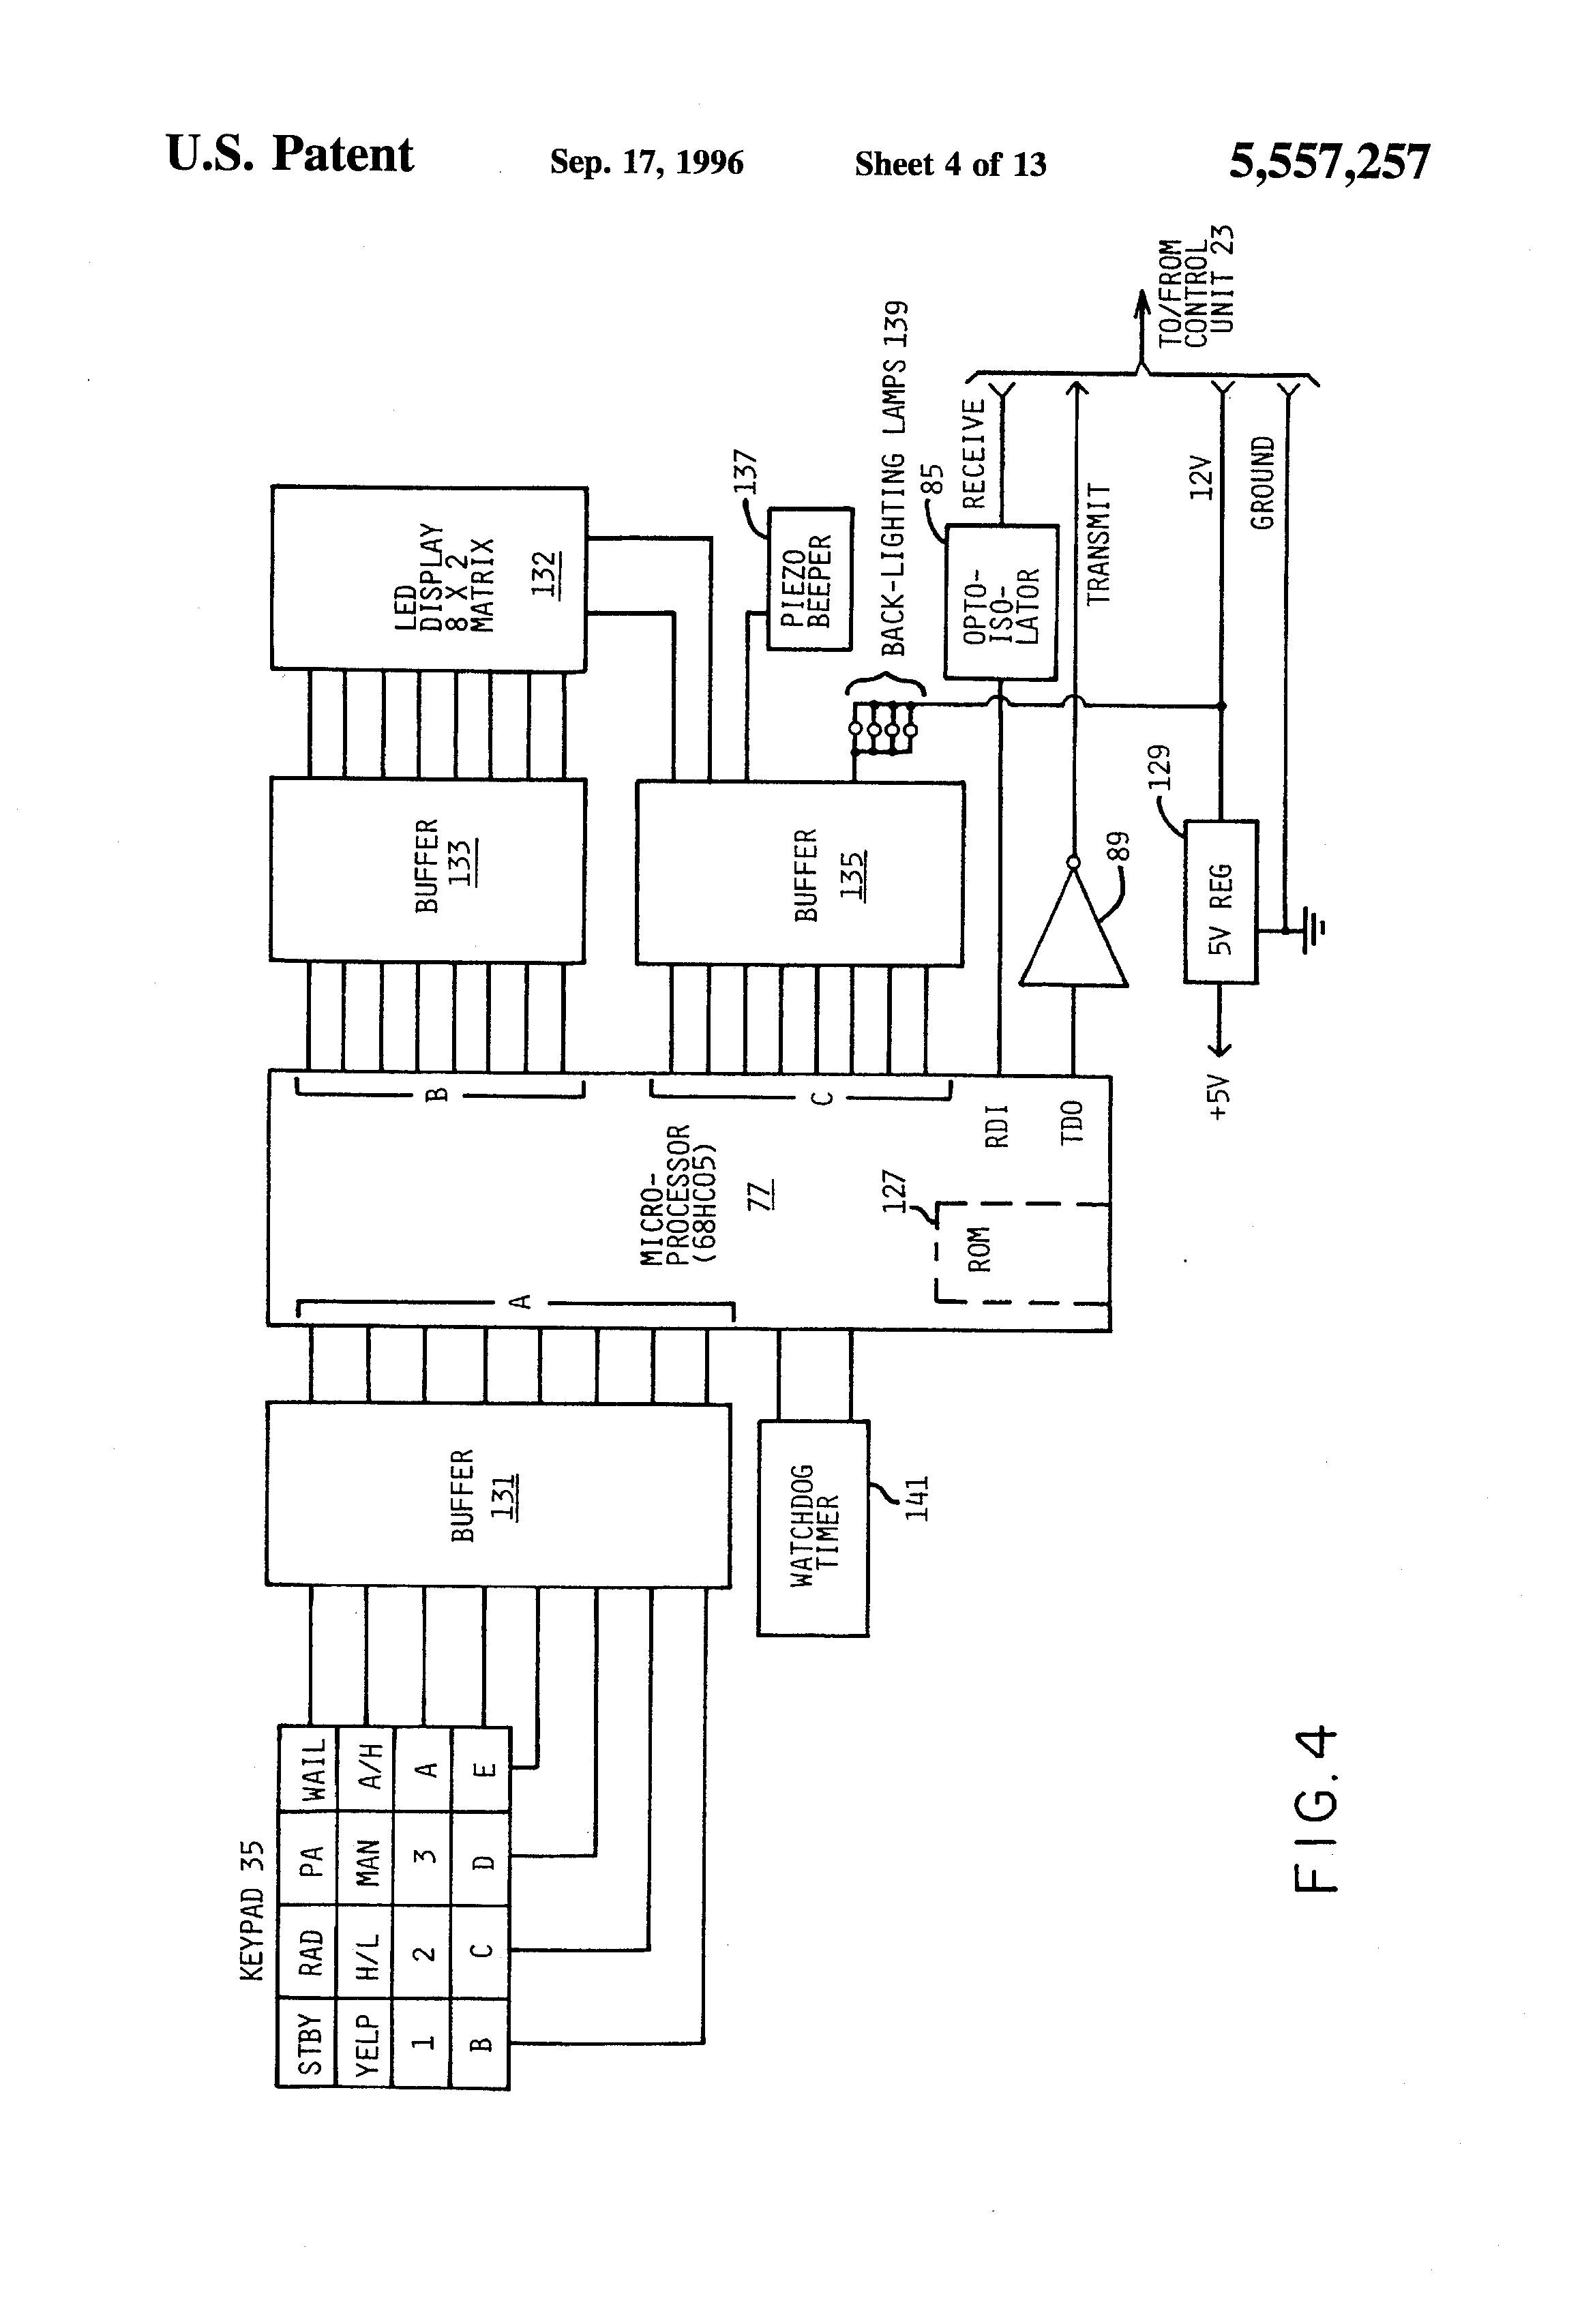 Mx 7000 Wiring Diagram | Manual e-books Code Mx Wiring Diagram on bosch oxygen sensor wiring diagram, viper alarm wiring diagram, galls wiring diagram, tao tao 110 wiring diagram, taotao atv wiring diagram, 3 wire diagram, beacon light wiring diagram, lightbar wiring diagram, federal signal wiring diagram, 911ep wiring diagram, whelen wiring diagram,